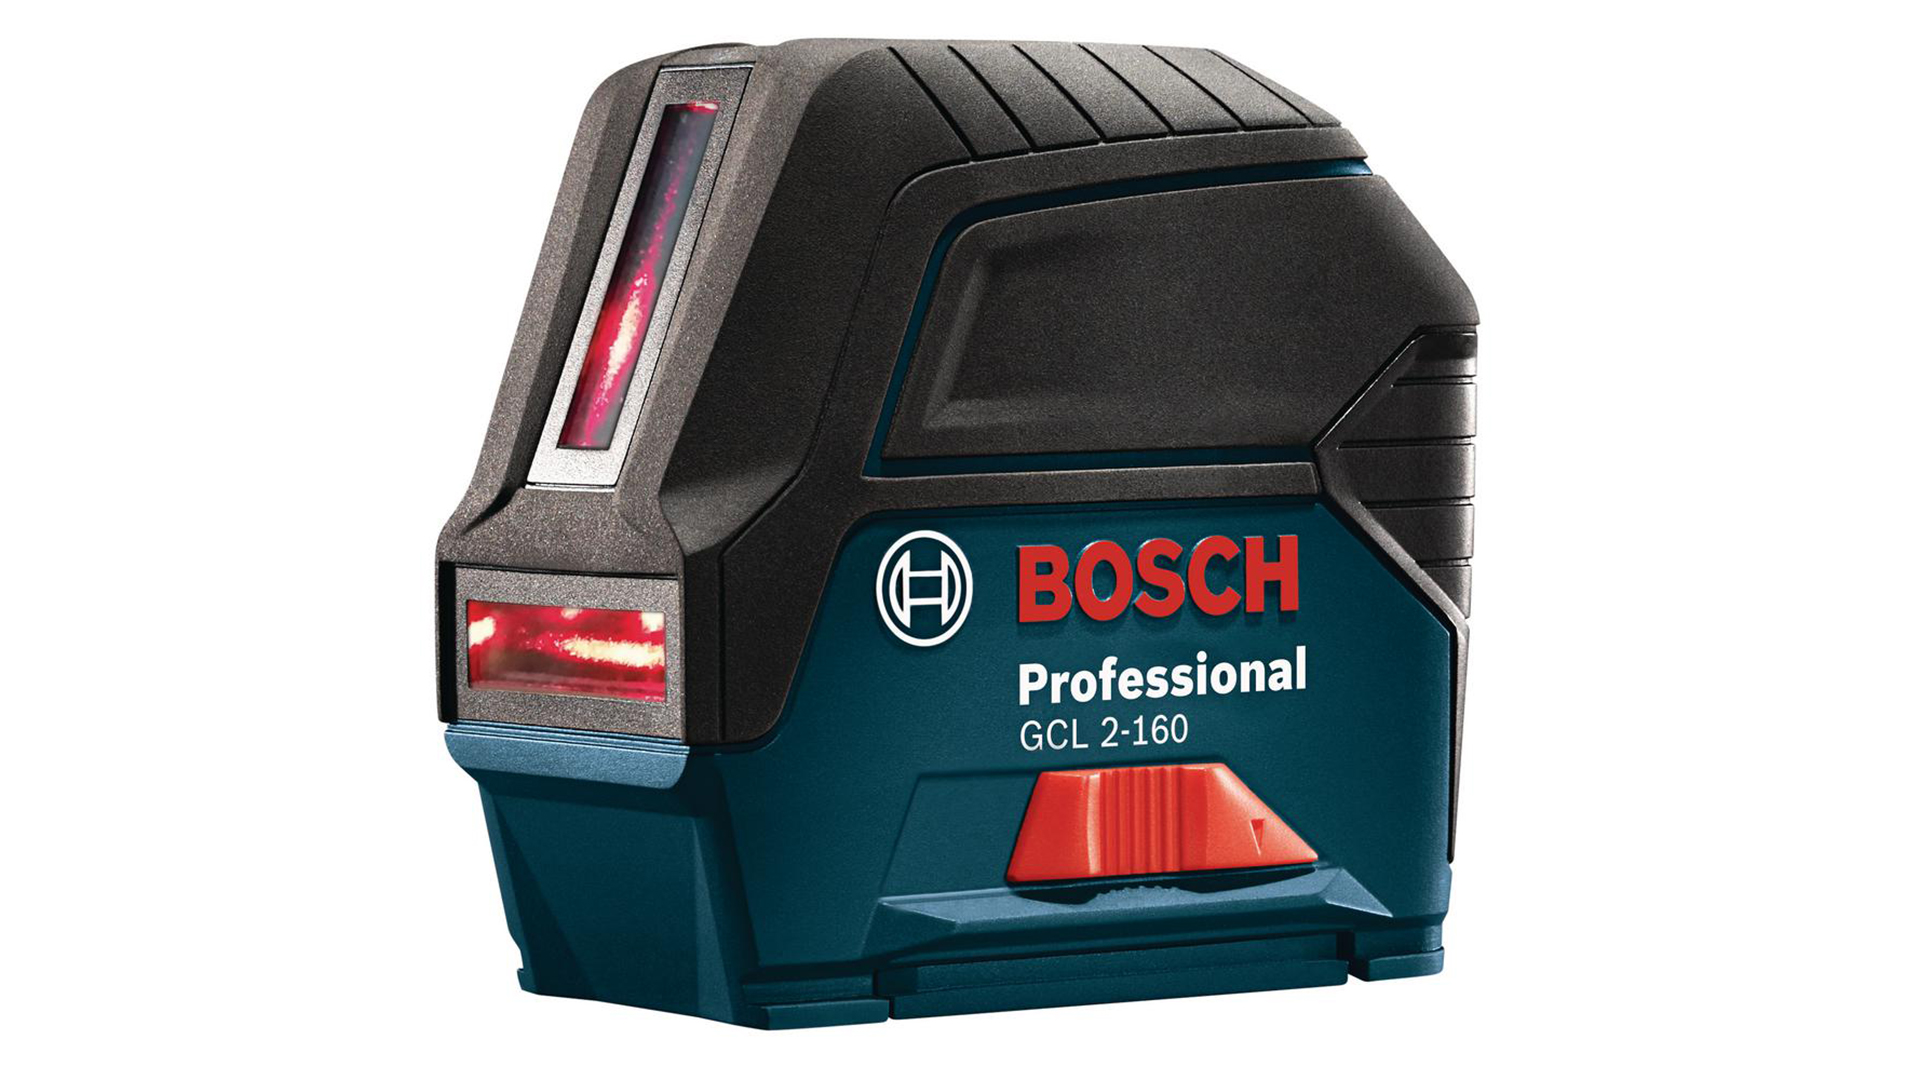 gll-30-bosch-laser-level-cross-line